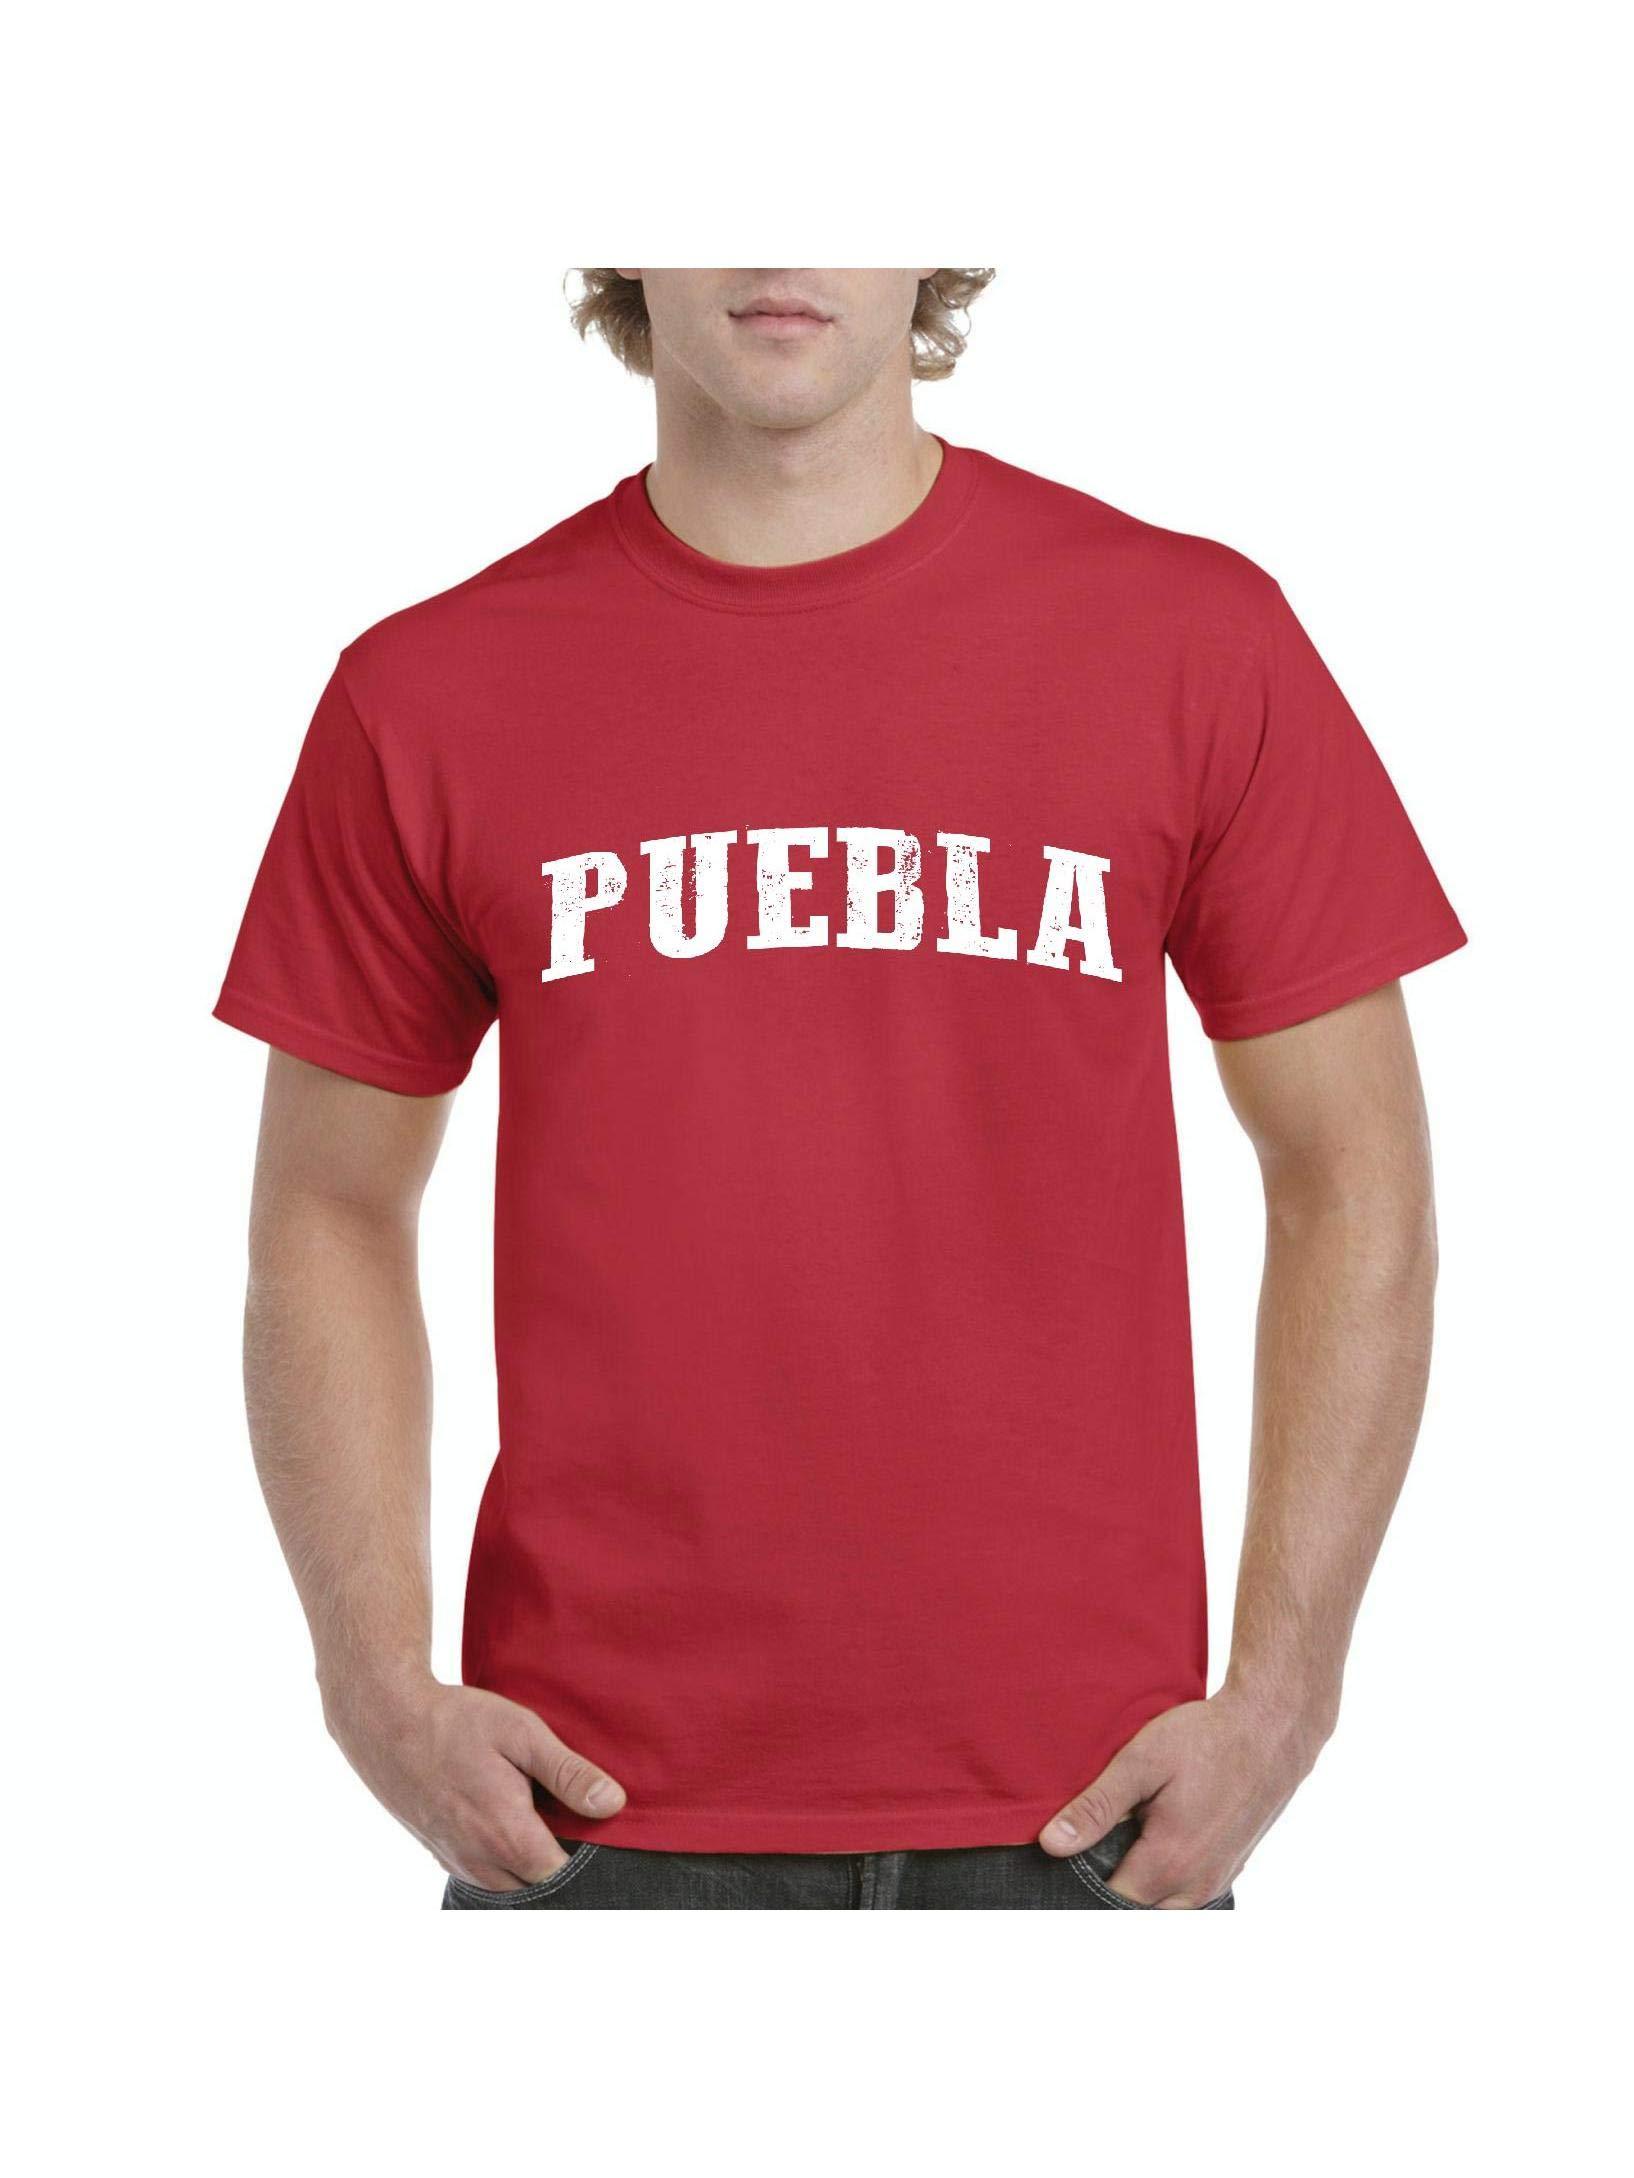 Mexico Cruise Family Vacation Gift Puebla Short Sleeve T Shirt 1798